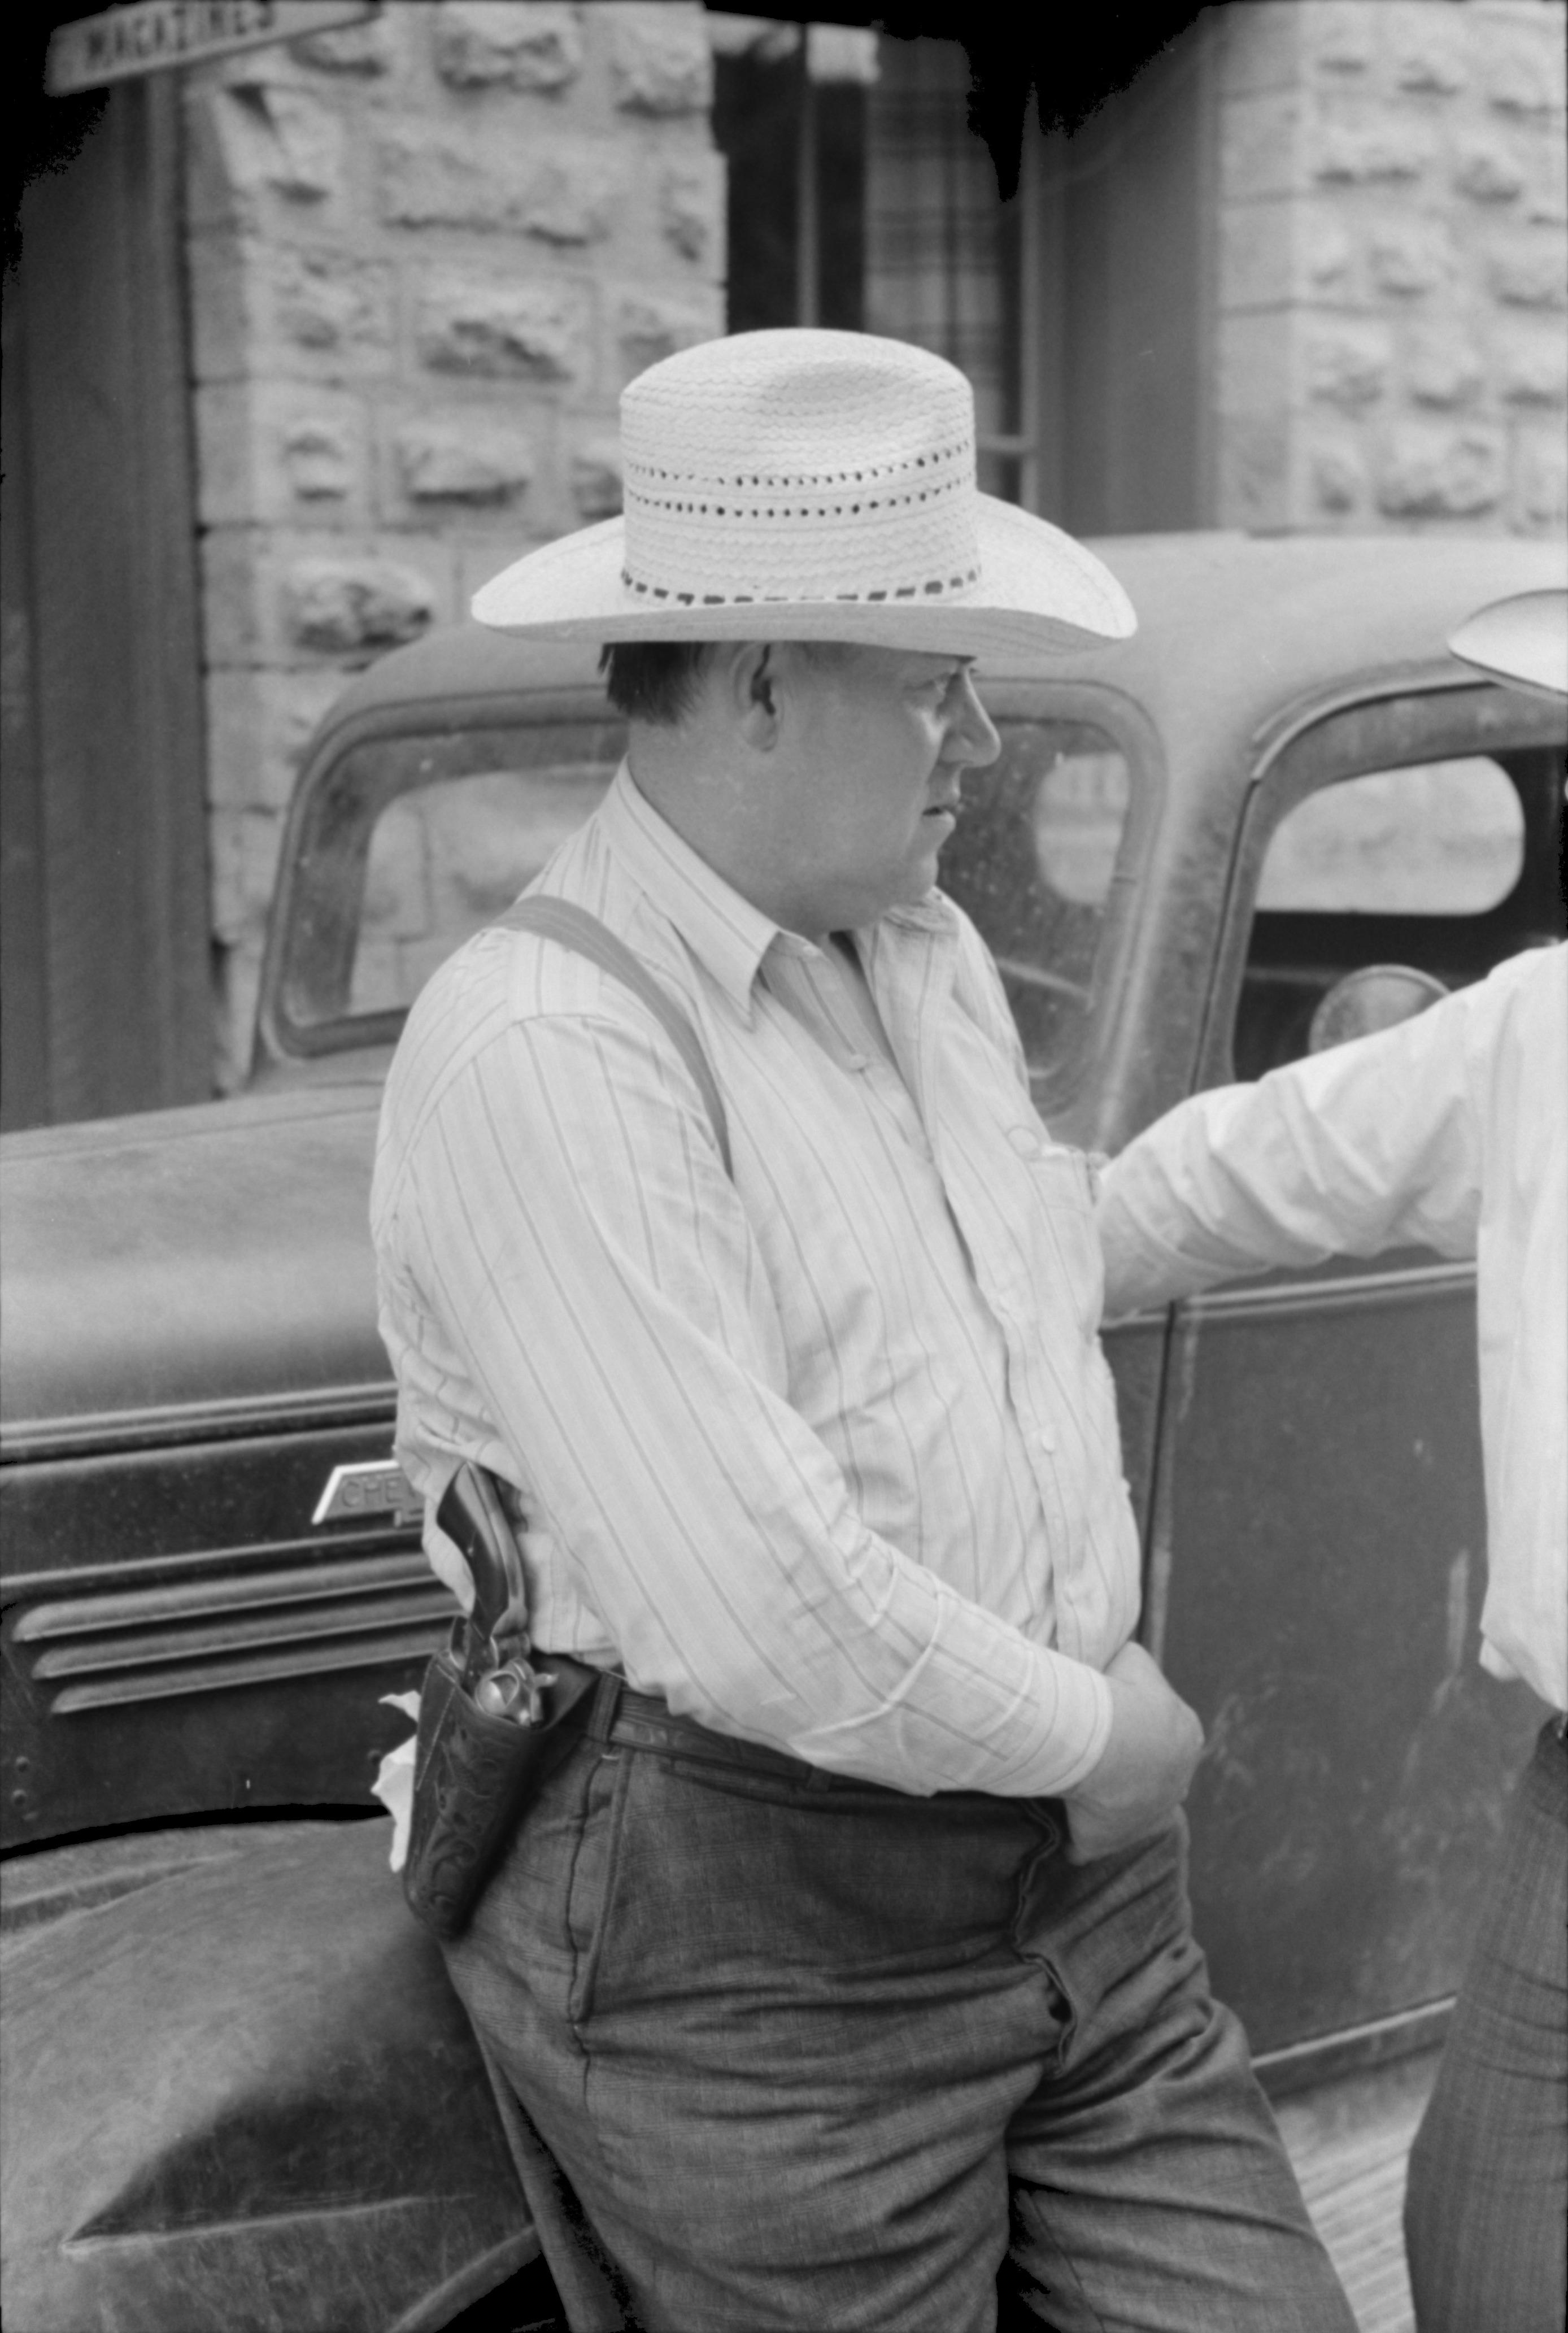 Deputy sheriff, Mogollon, New Mexico